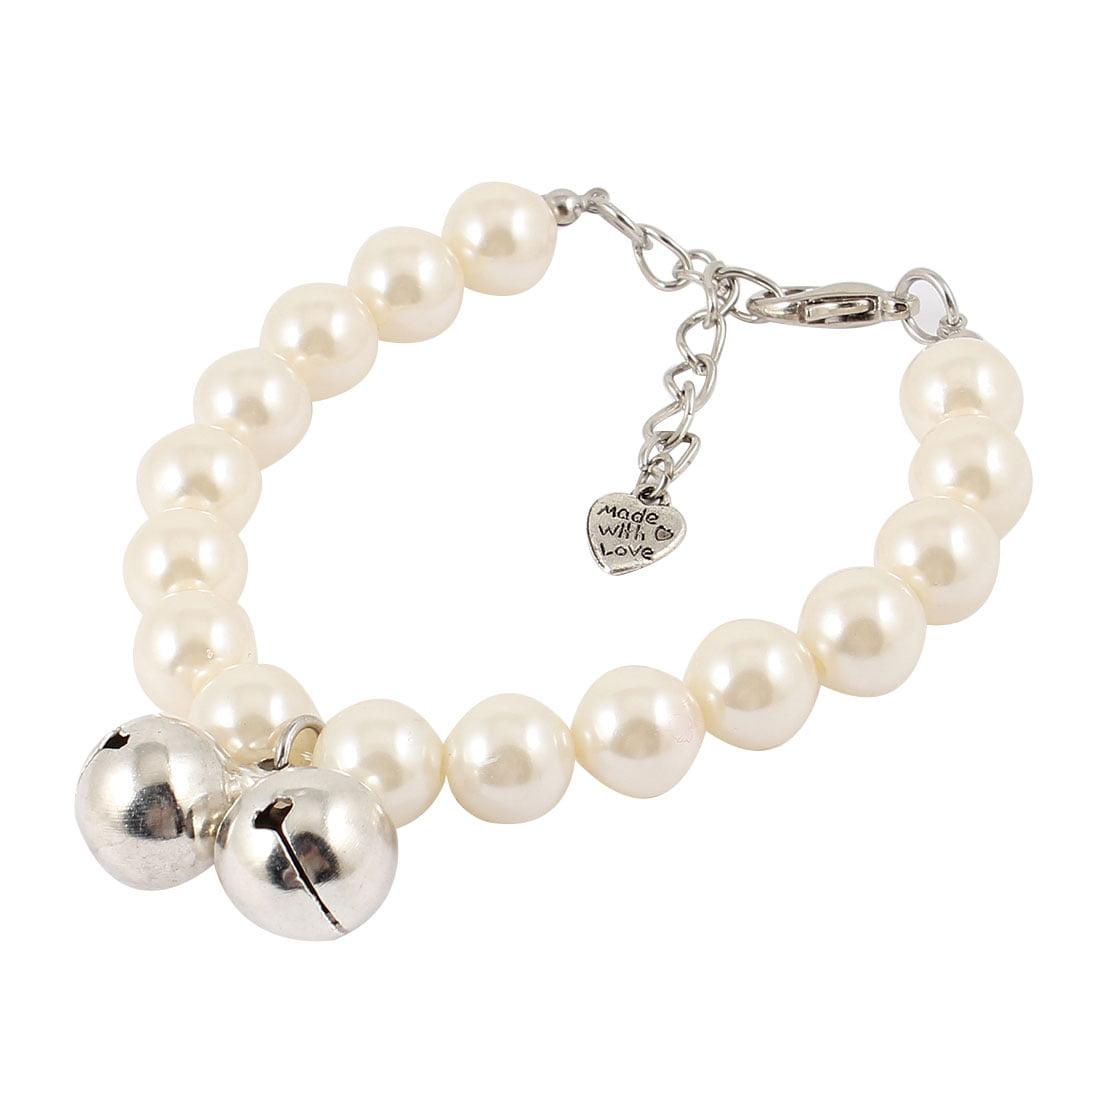 Bell Pendant White Faux Pearl Decoration Pet Dog Yorkie Cat Collar Necklace S by Unique Bargains